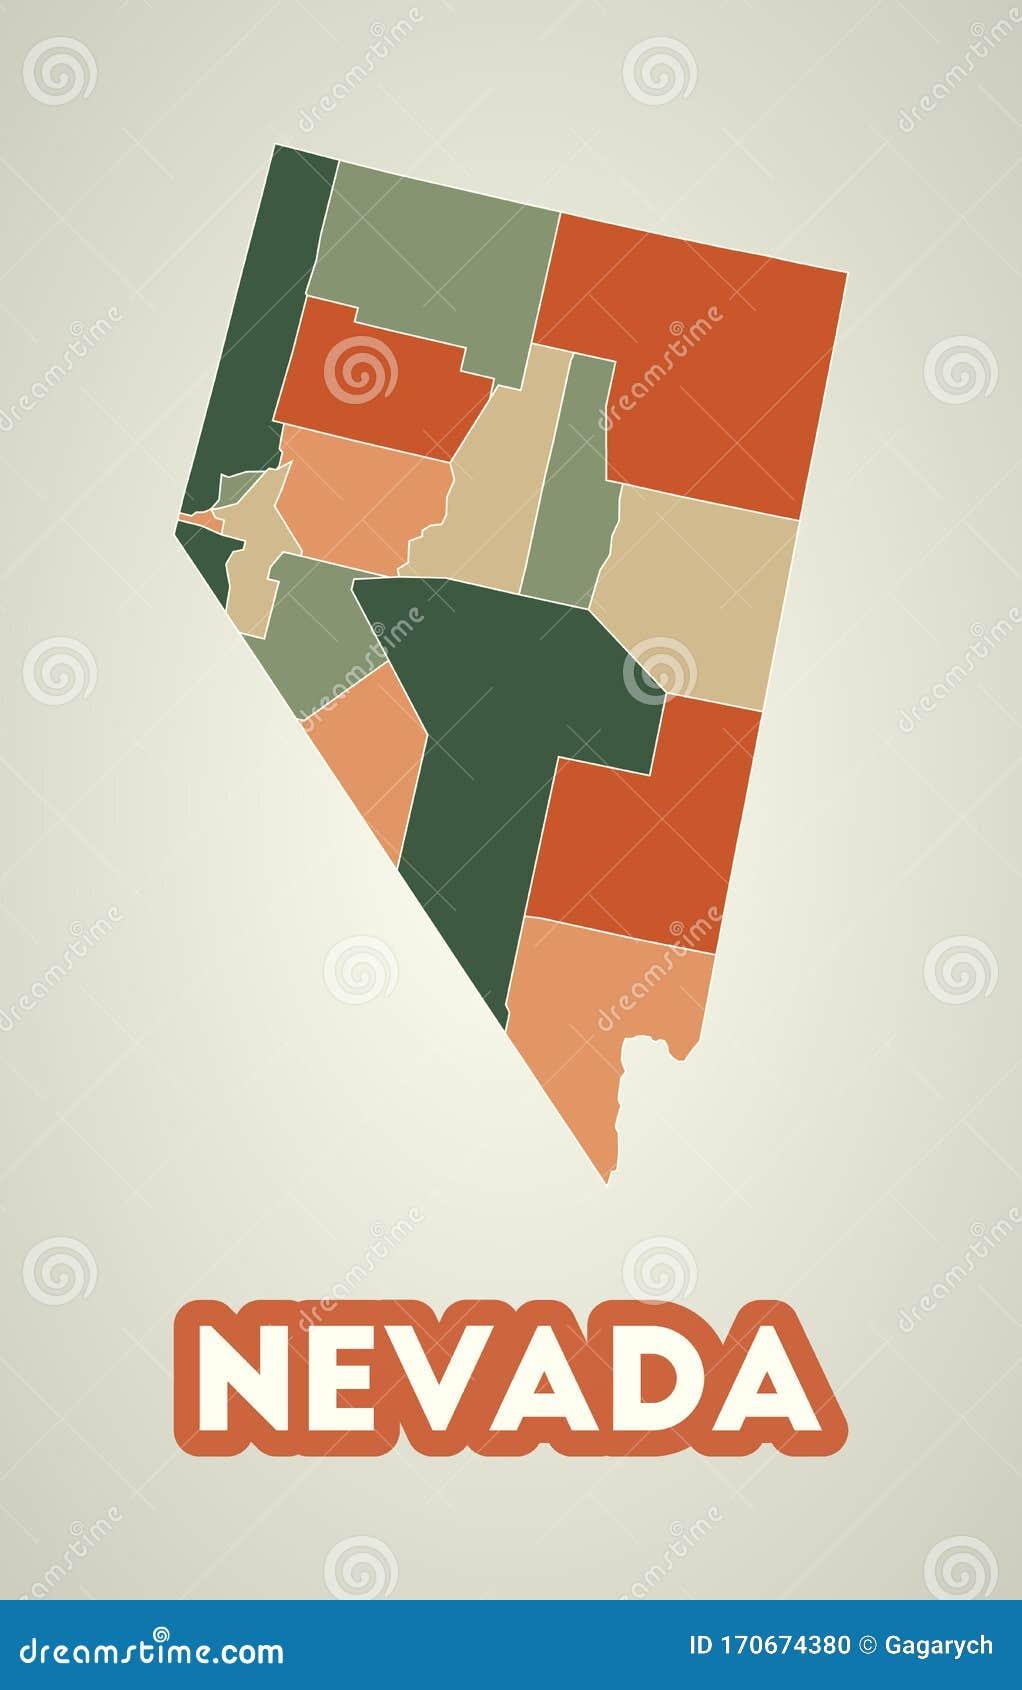 Nevada Poster In Retro Style Stock Vector Illustration Of Colorado Destination 170674380